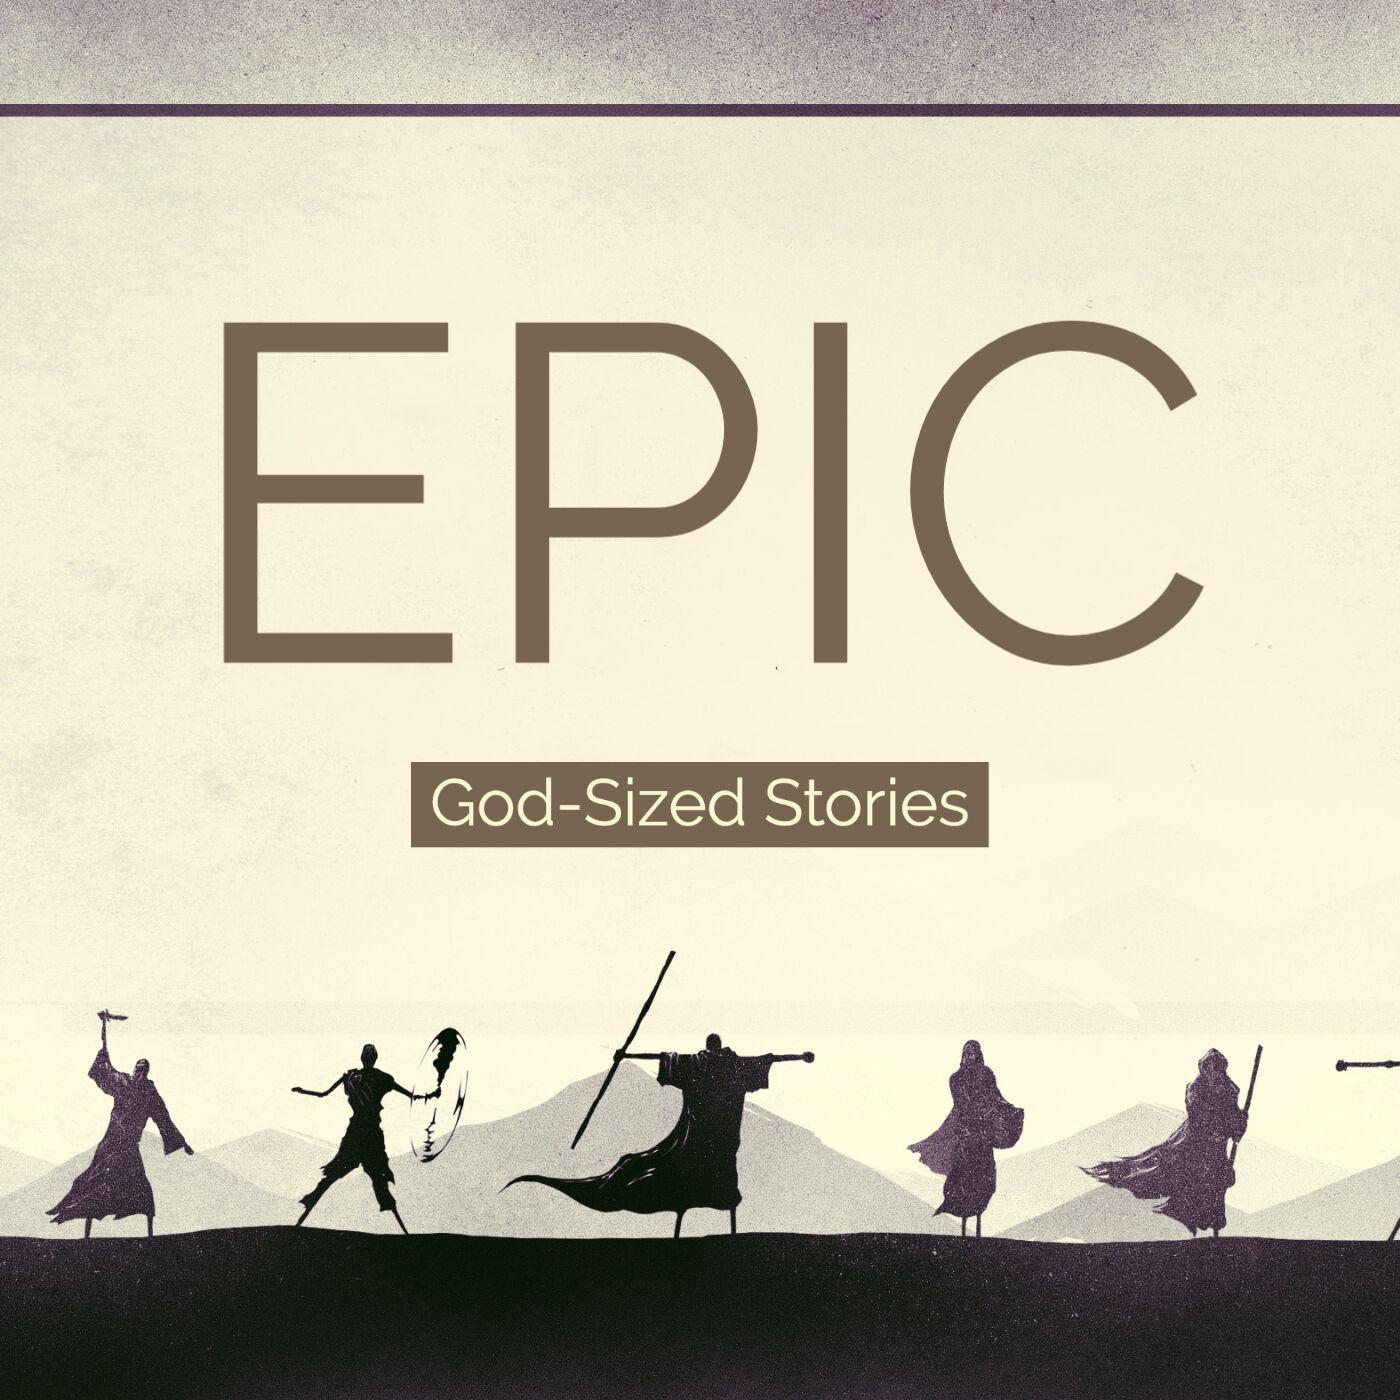 EPIC: God Sized Stories [Part 5 - Beware Shortcuts]